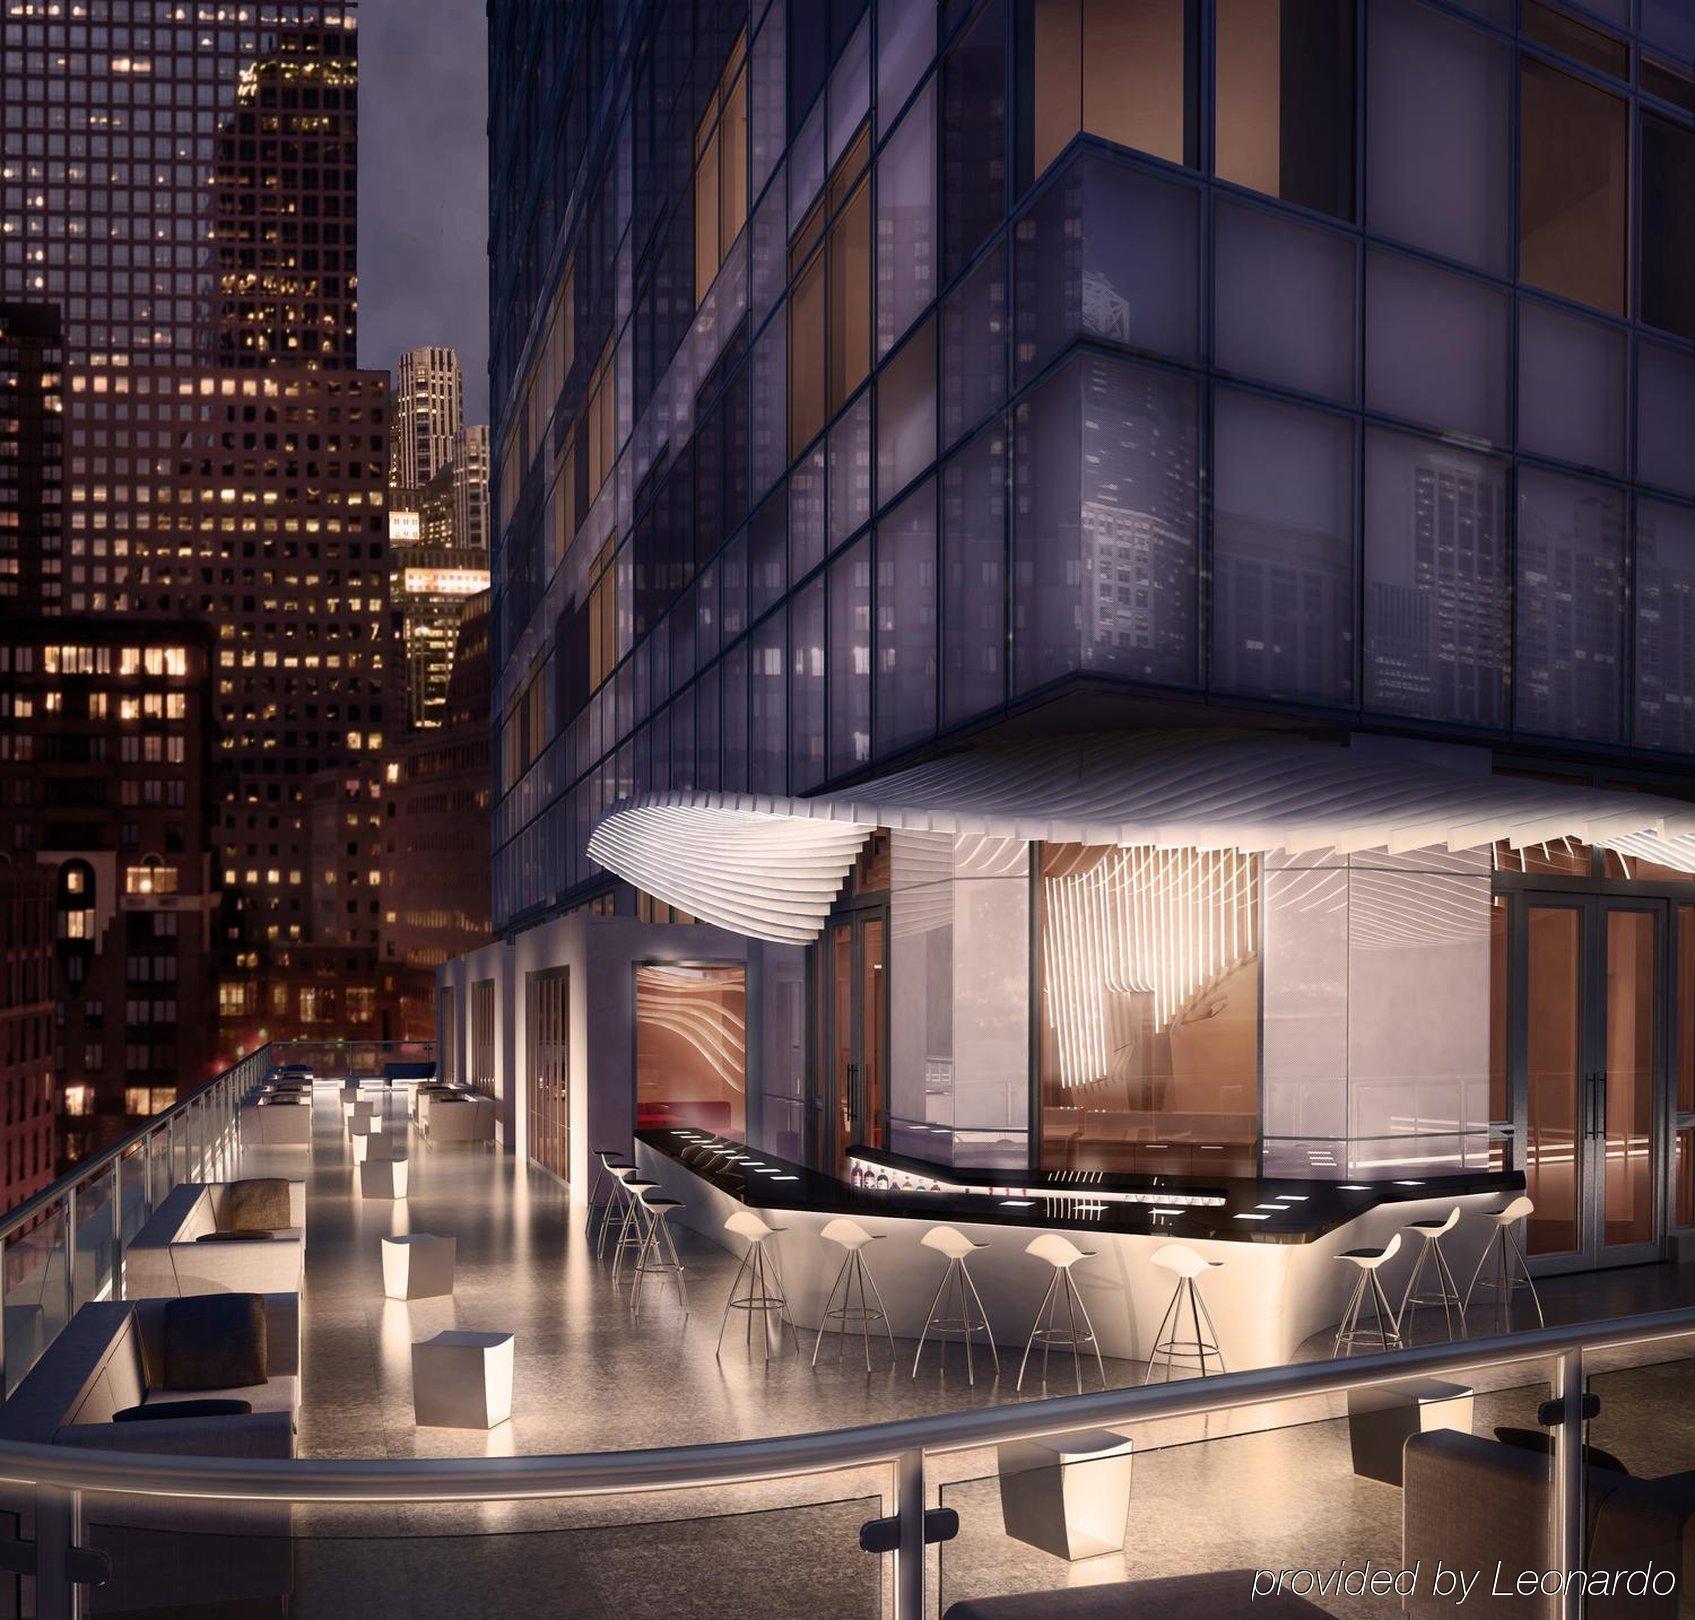 Hotel w new york downtown new york city for New walk terrace york